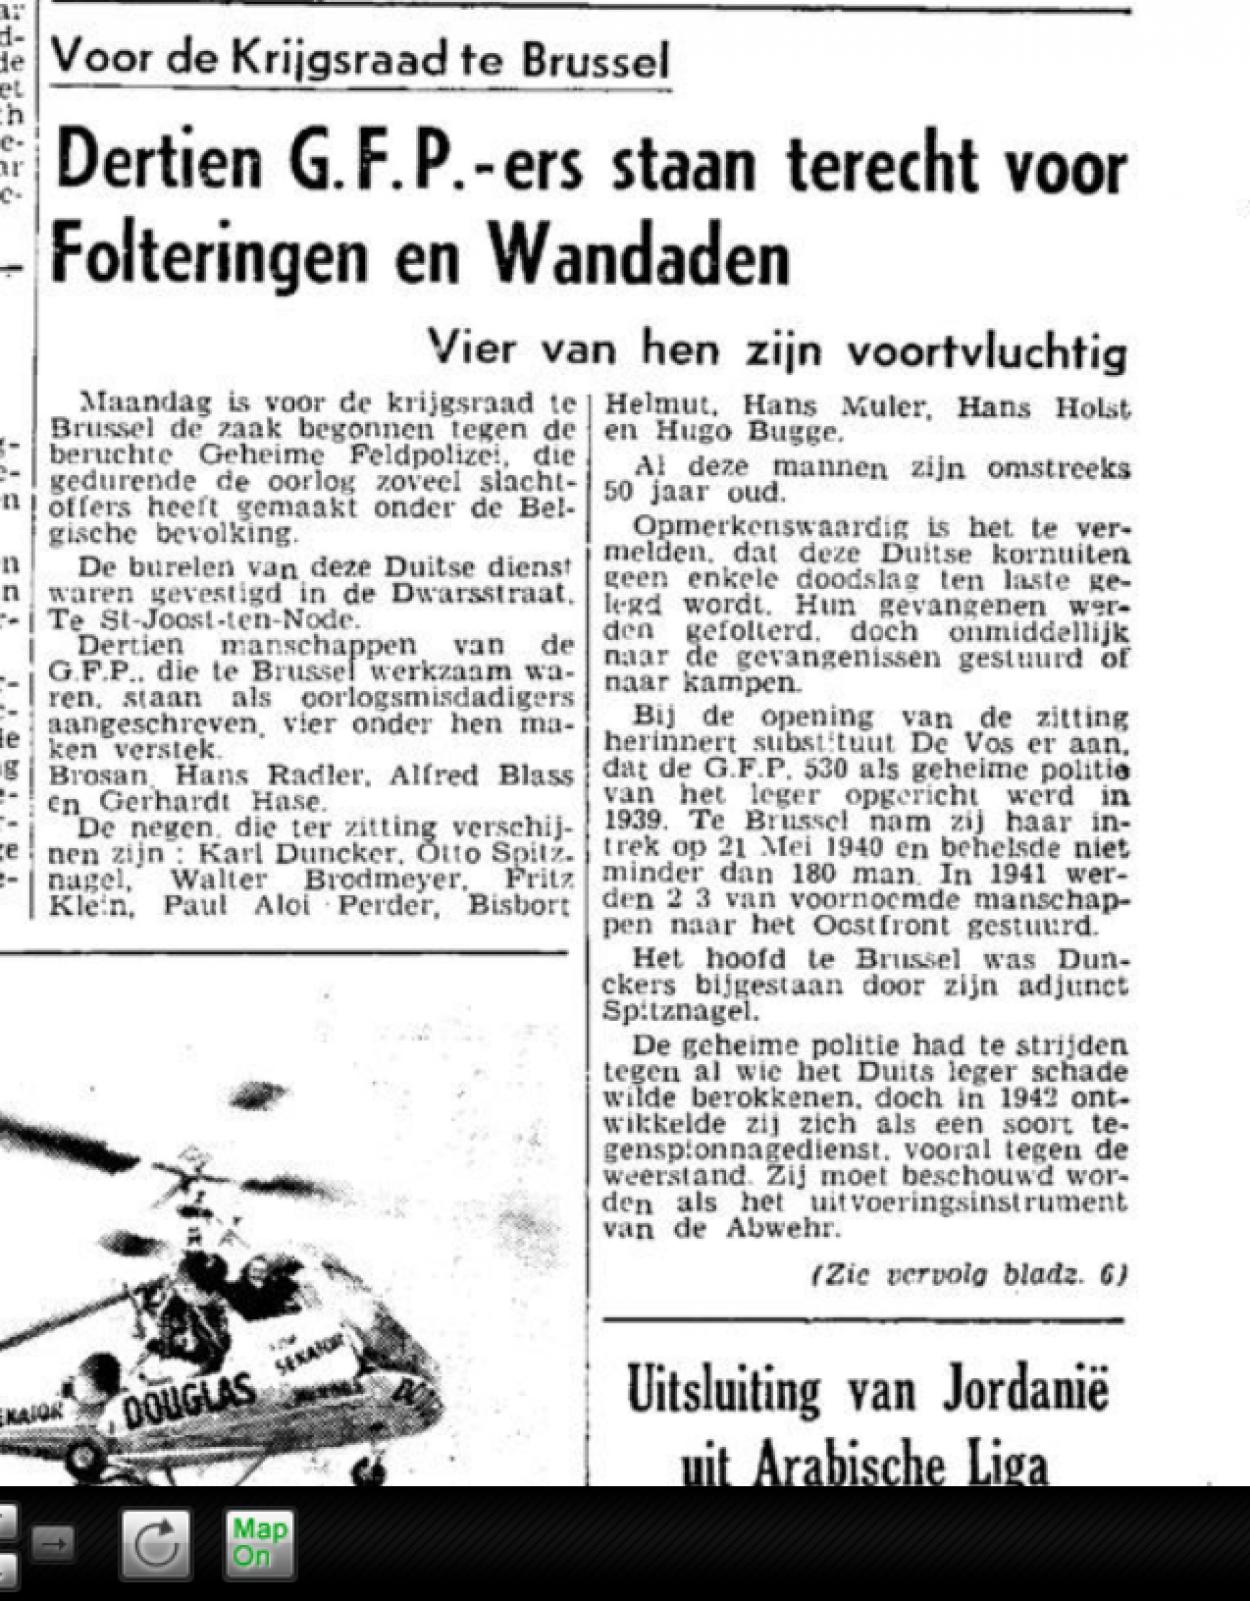 volksgazet-16-5-1950-p-1.png